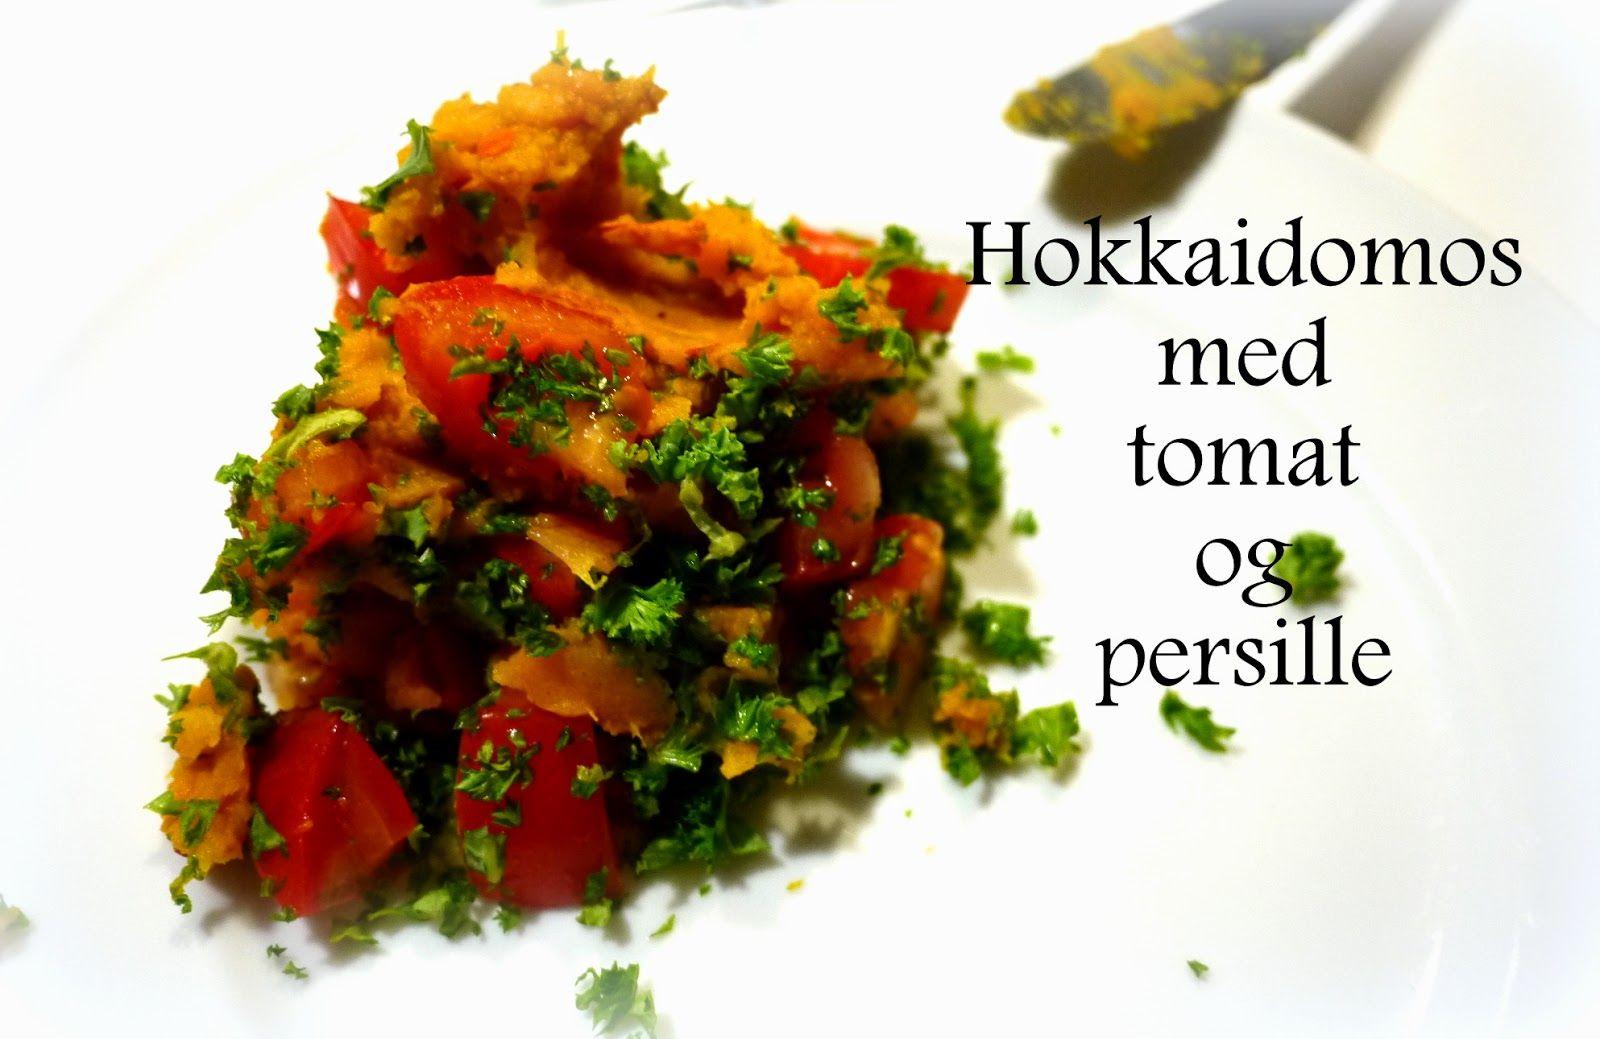 Paleolivet: Hokkaidomos med friske tomater og persille